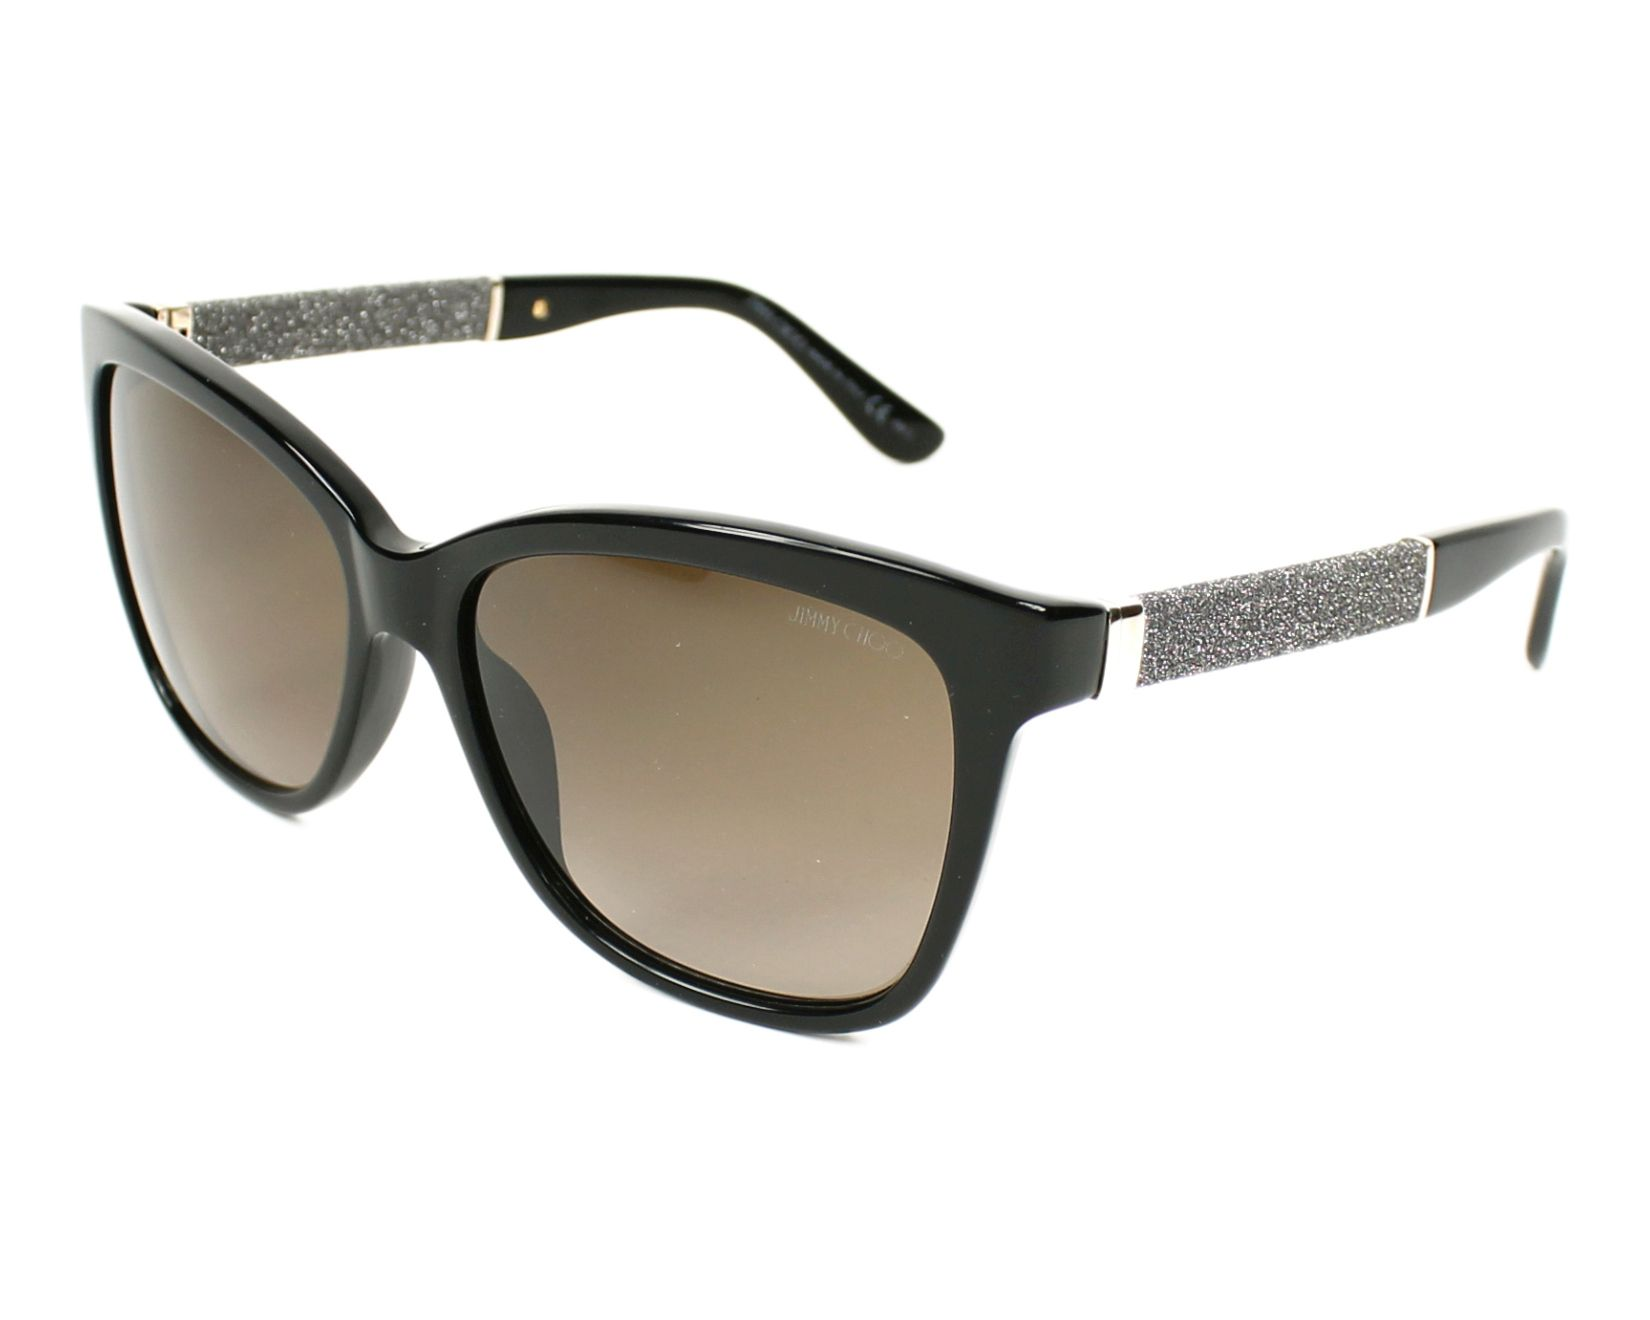 5f828dad3c4 thumbnail Sunglasses Jimmy Choo CORA-S FA3 J6 - Silver Black profile view